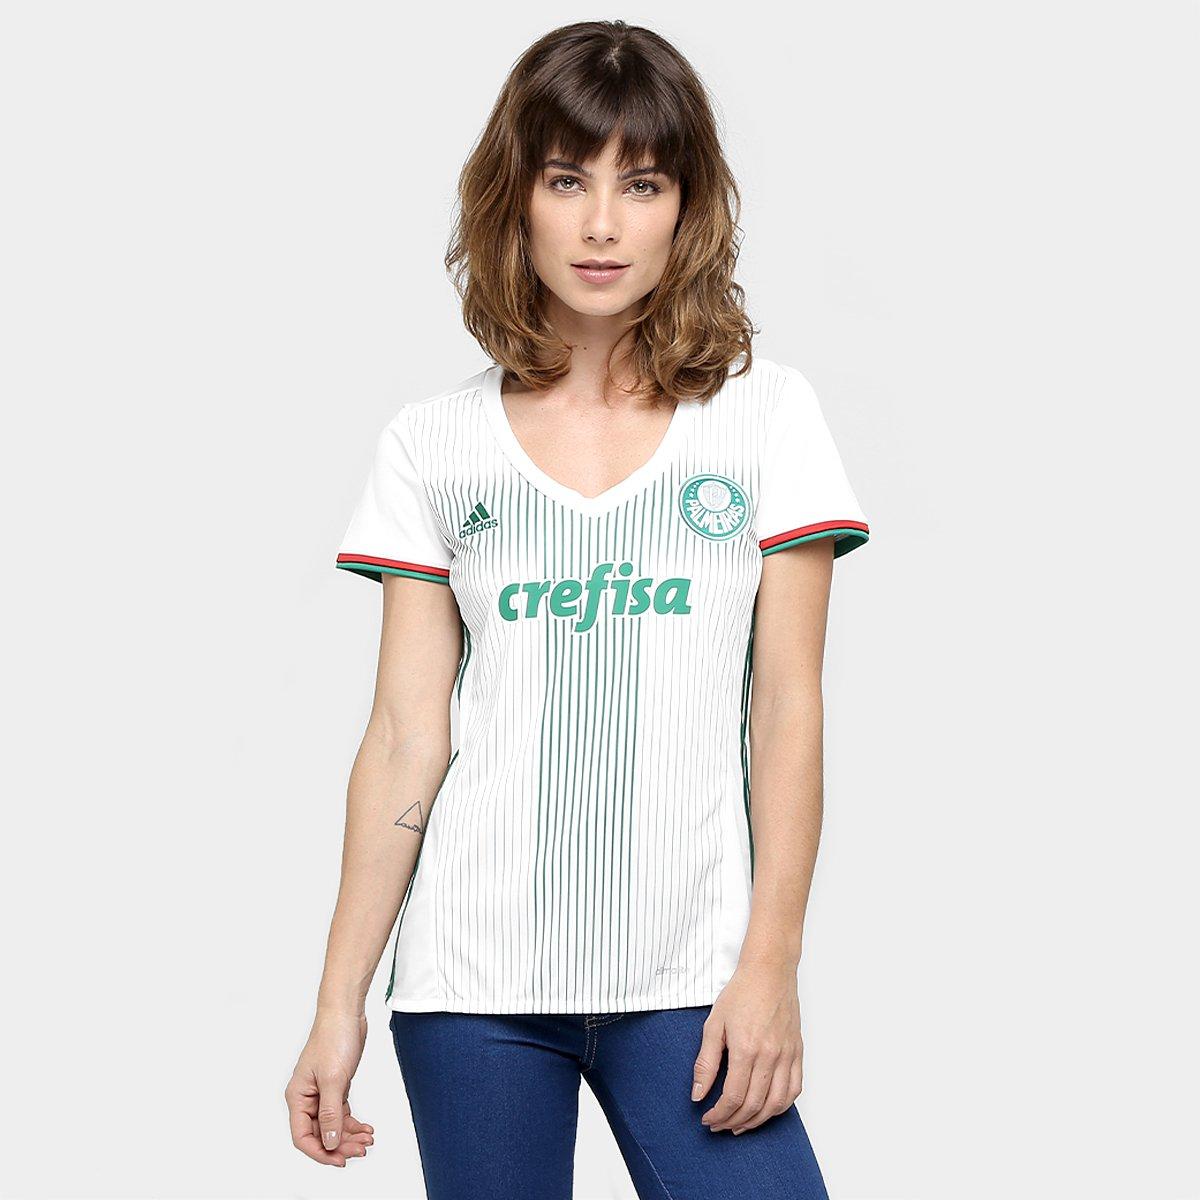 Camisa Palmeiras II 2016 s nº Torcedor Adidas Feminina - Compre ... 70ace7517cc50